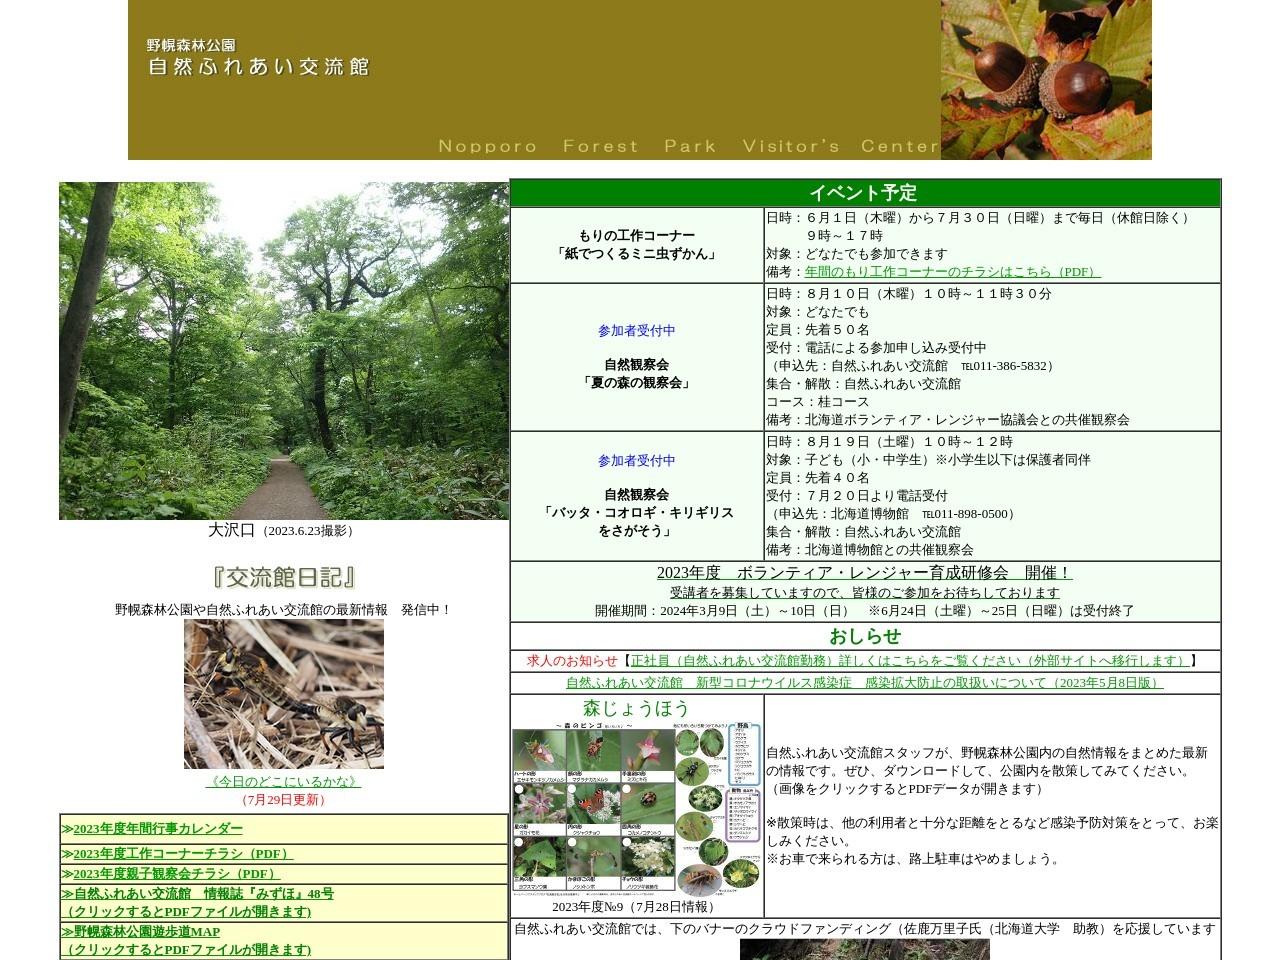 http://www.kaitaku.or.jp/nfpvc.htm